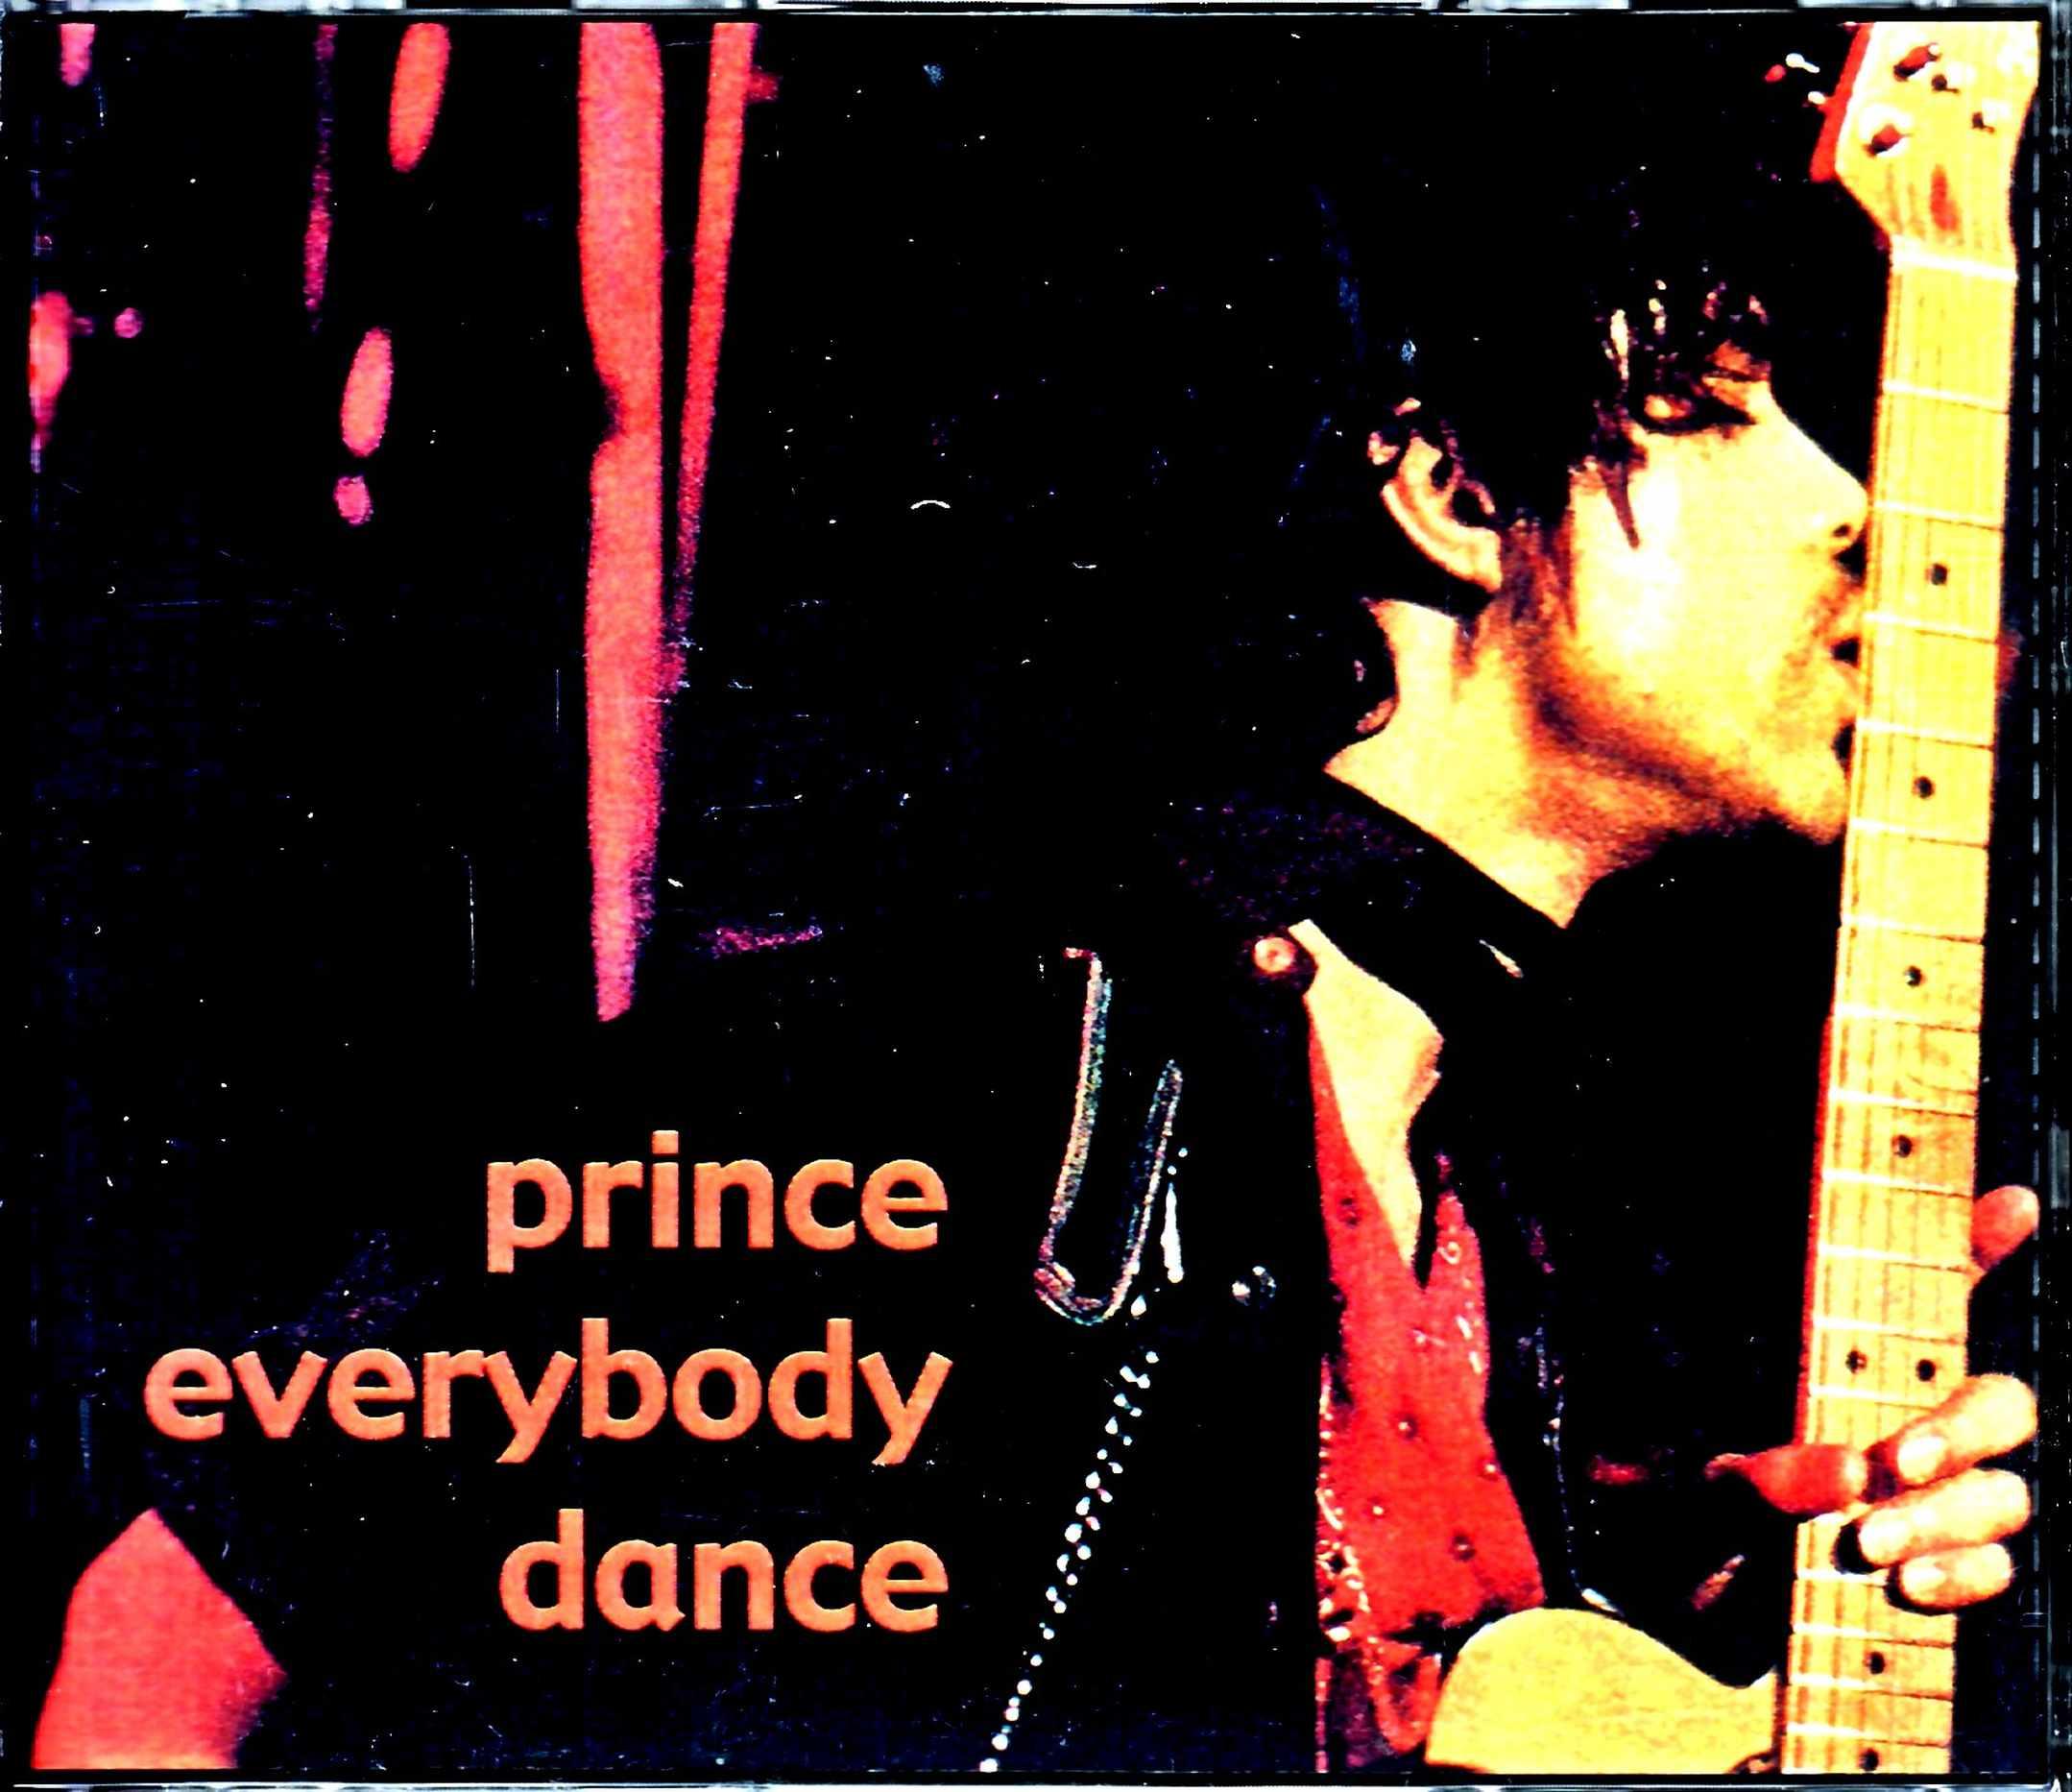 Prince プリンス/MN,USA 3.9.1981 Remastered